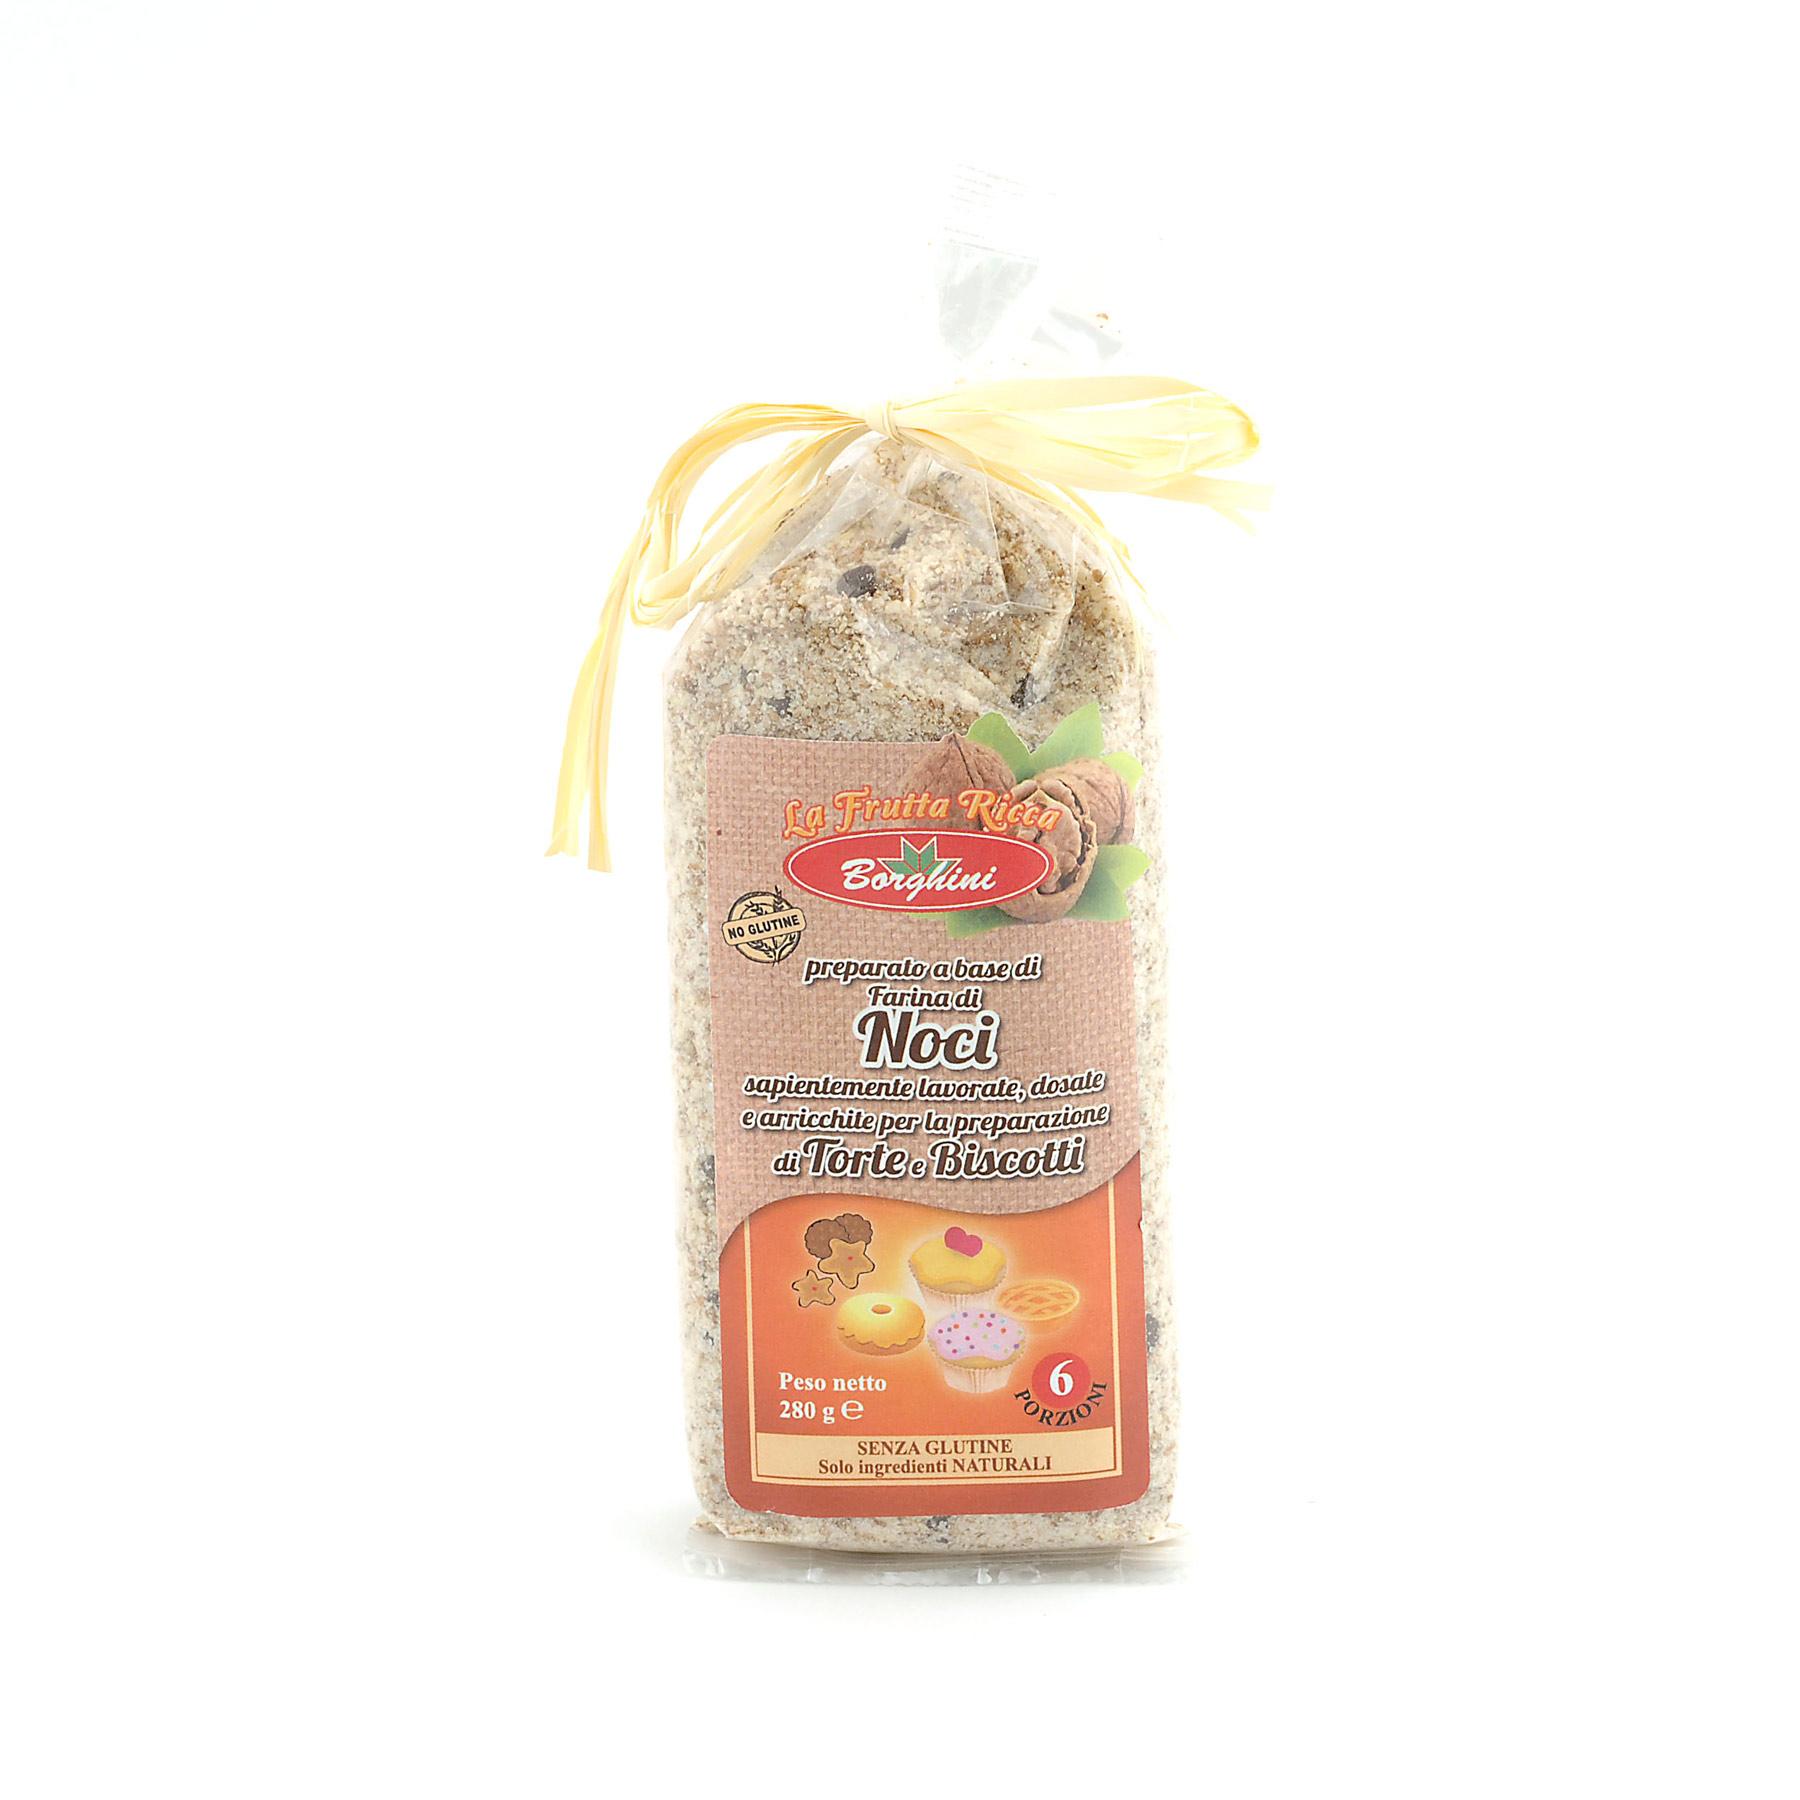 'Noci' Walnut Cake mix *Gluten free* from Borghini